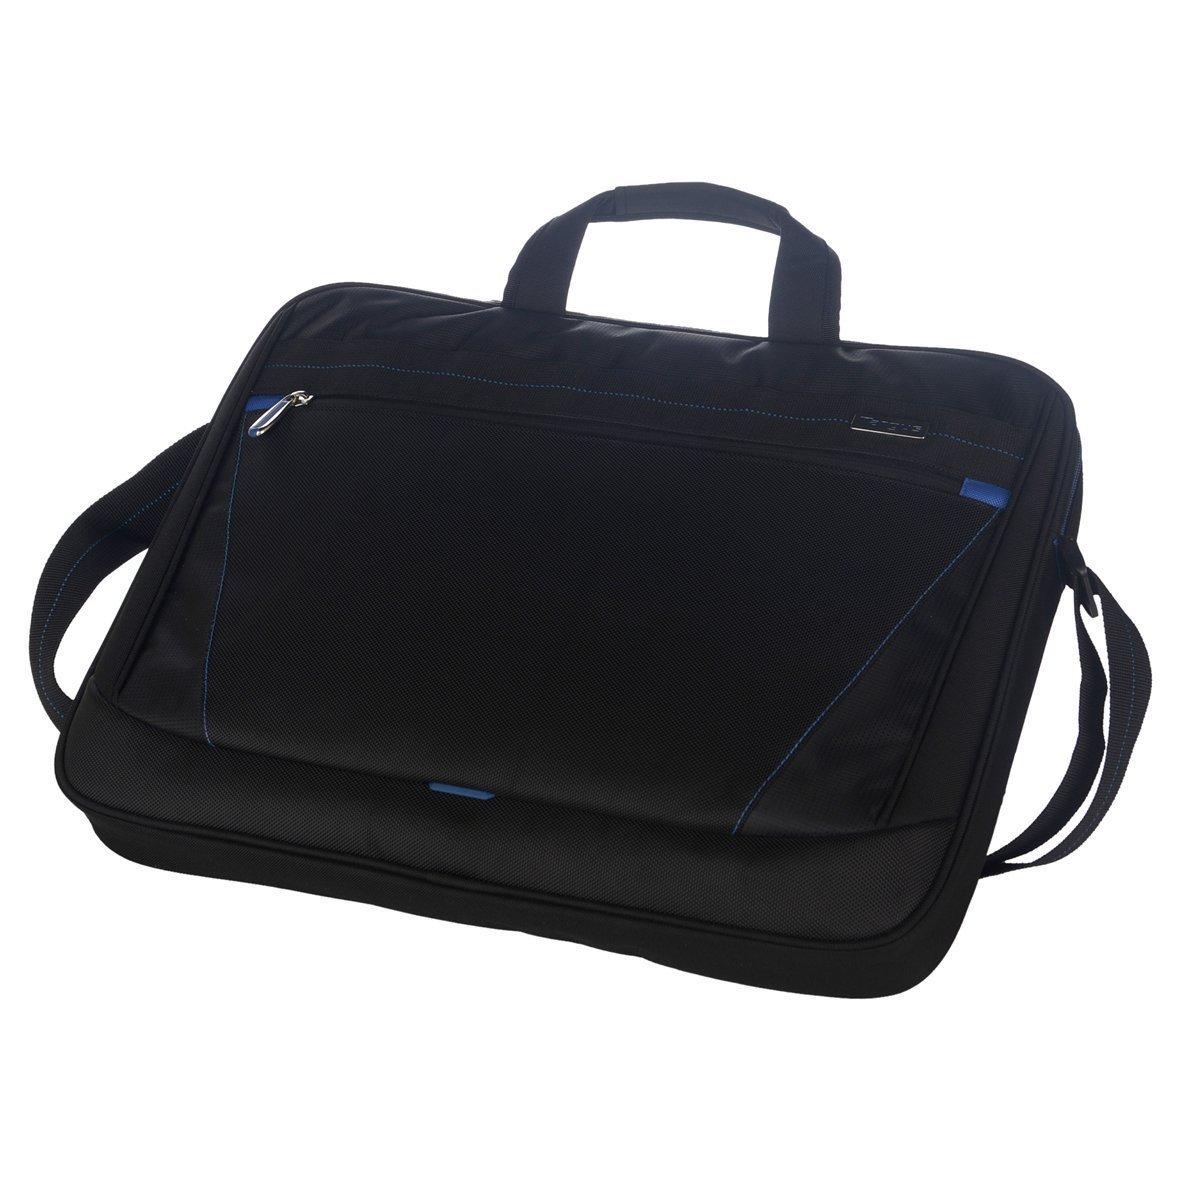 Targus  Prospect Topload Laptop Computer Bag / Case fits 15.6 inch laptops - Black TBT259EU